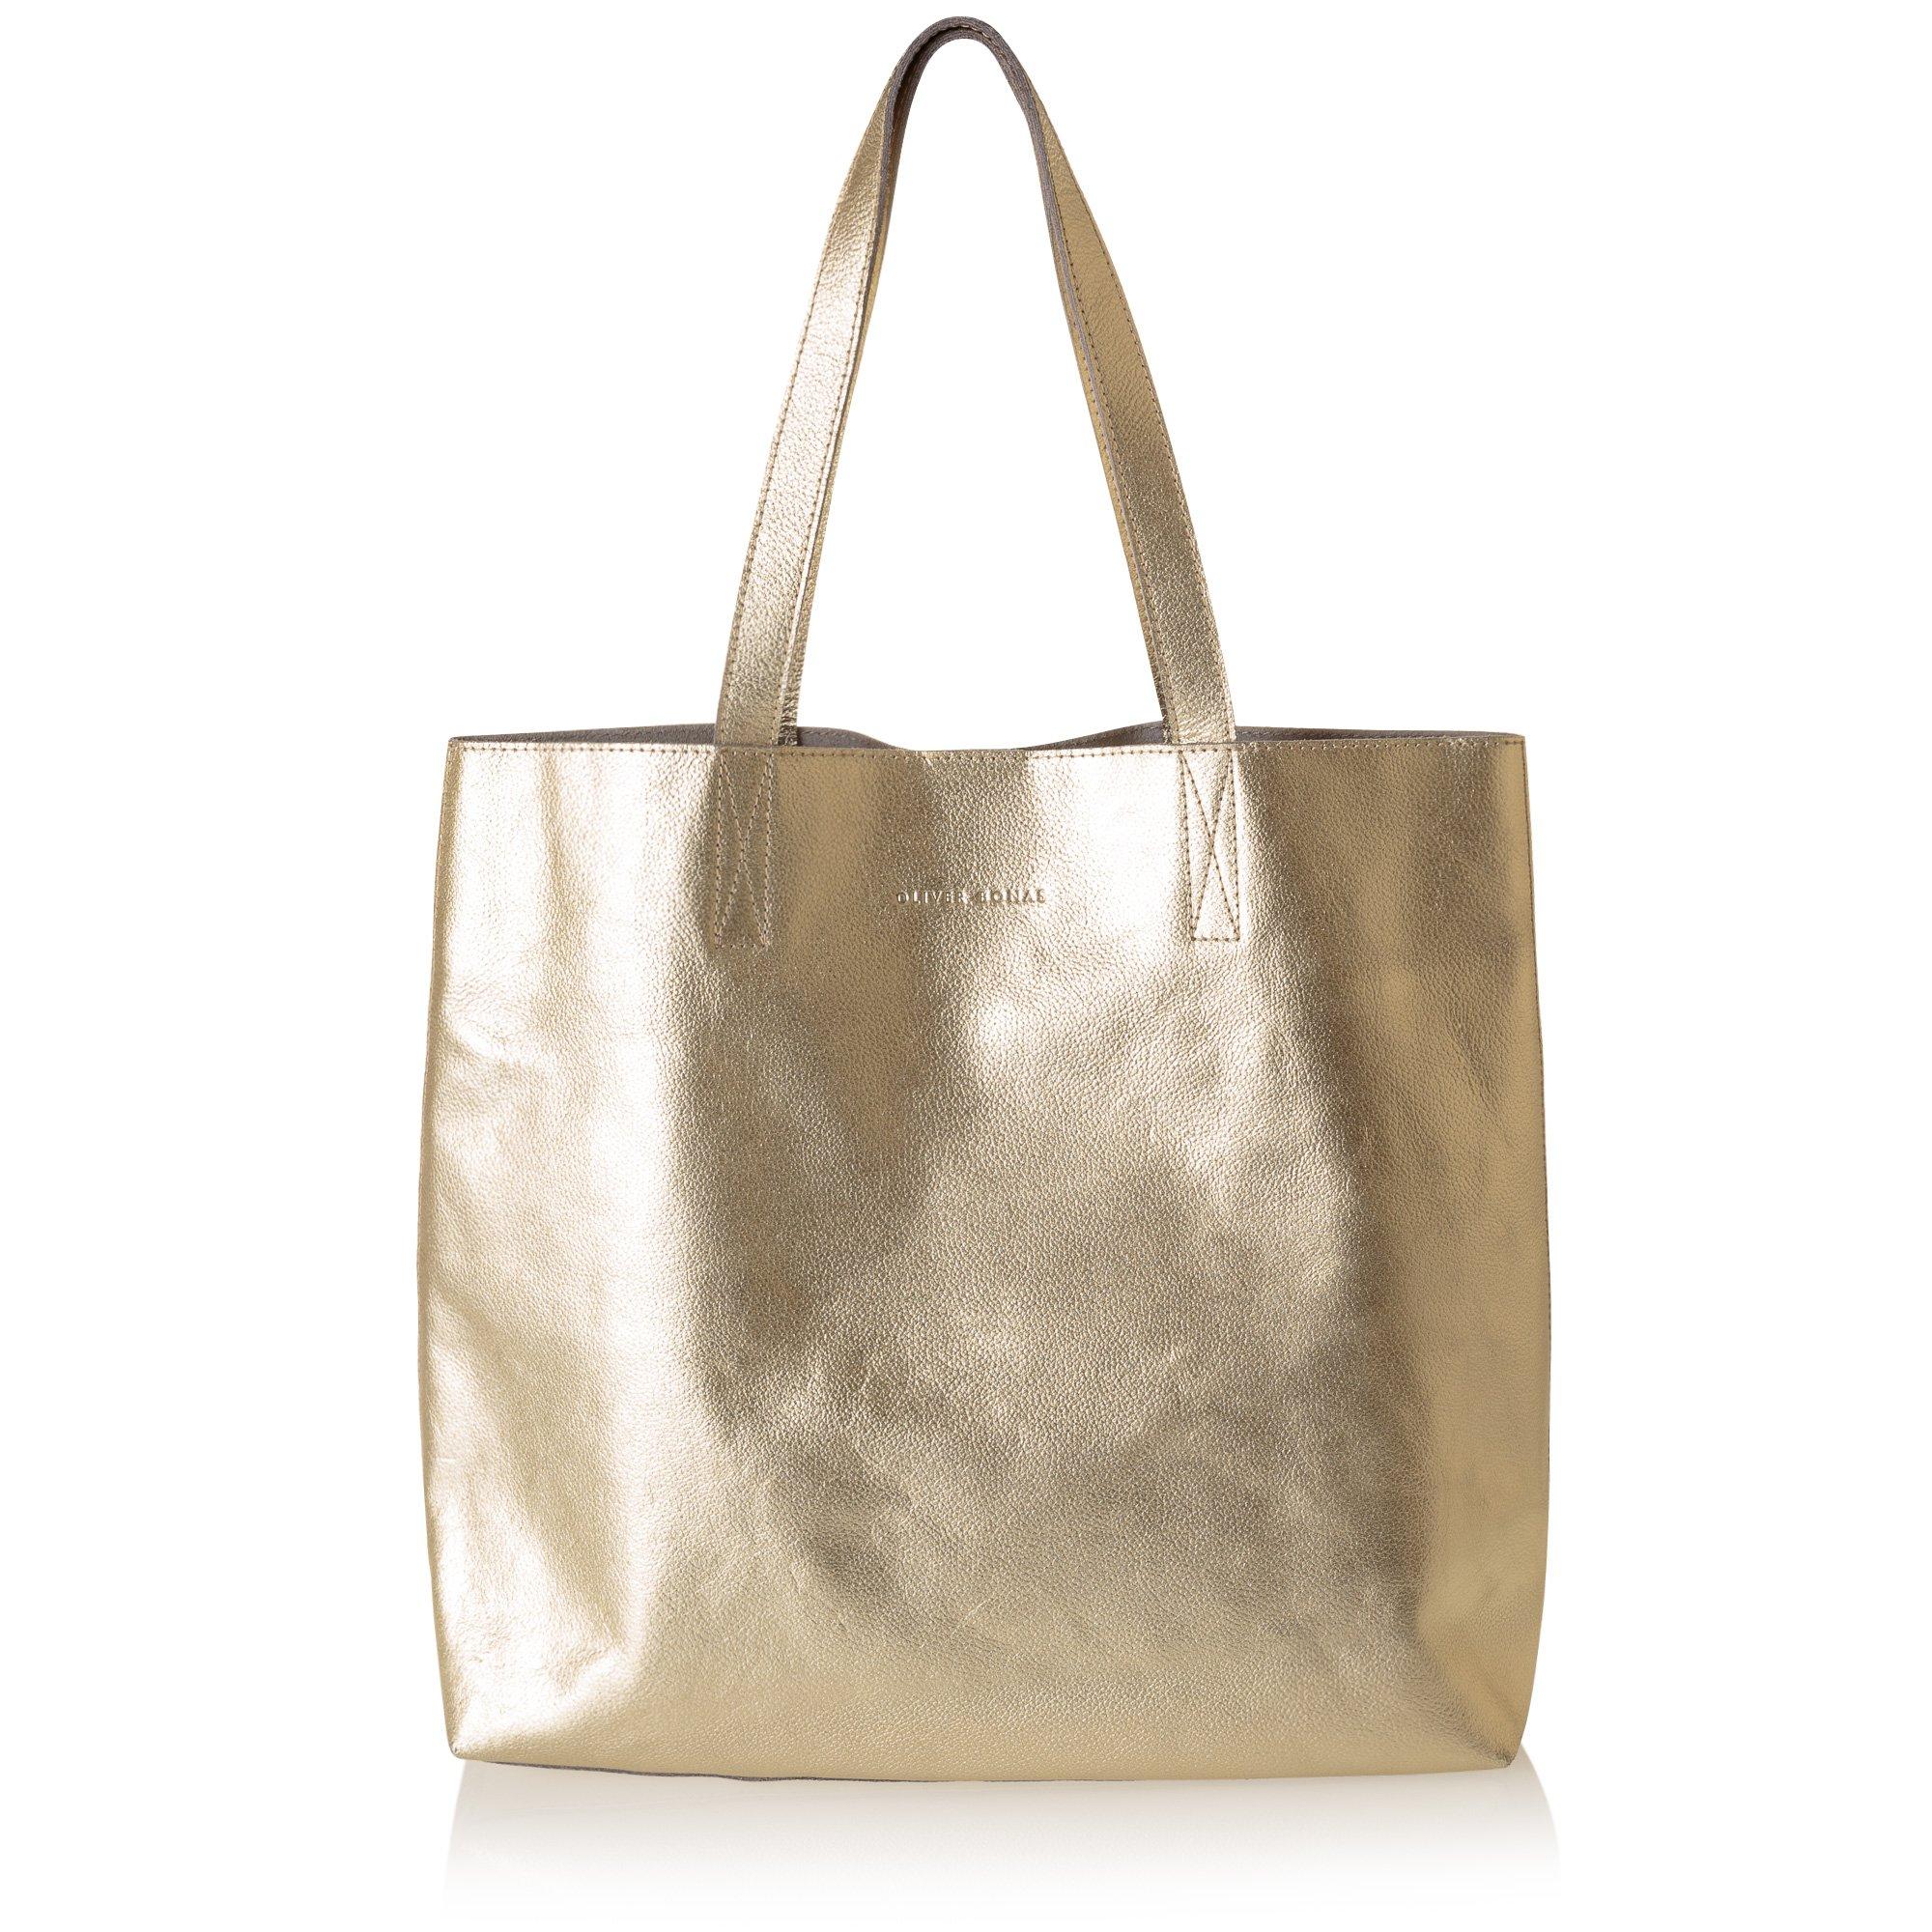 Free Comic Book Day Uk Store Locator: Gold Gold Metallic Leather Handbag